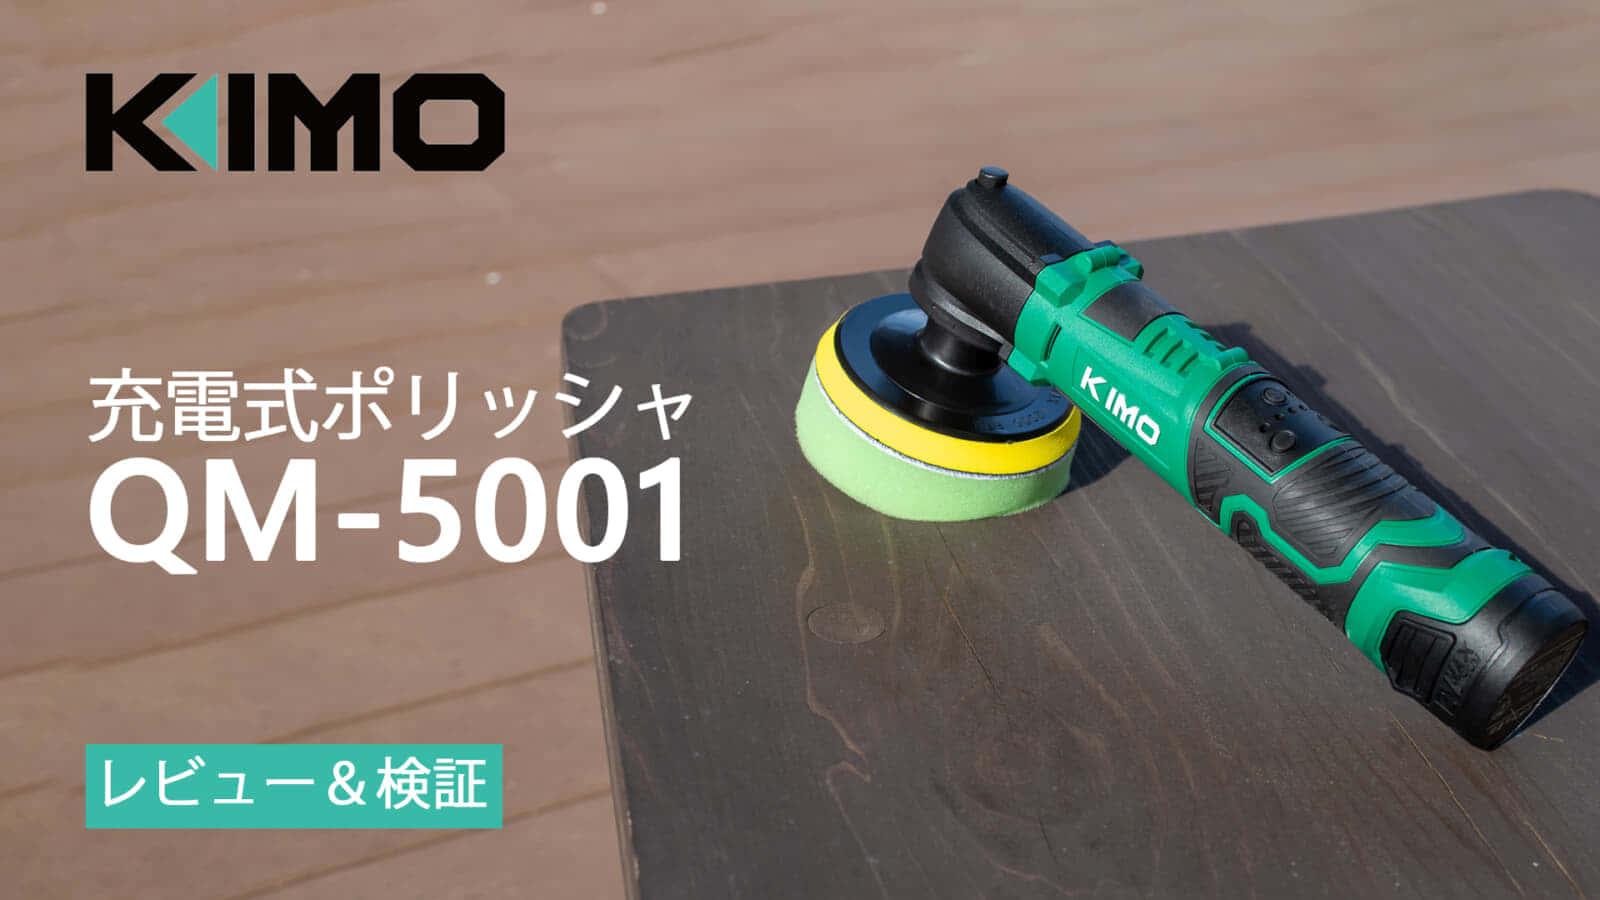 KIMO 充電式12Vポリッシャレビュー、低価格DIY向けポリッシャ